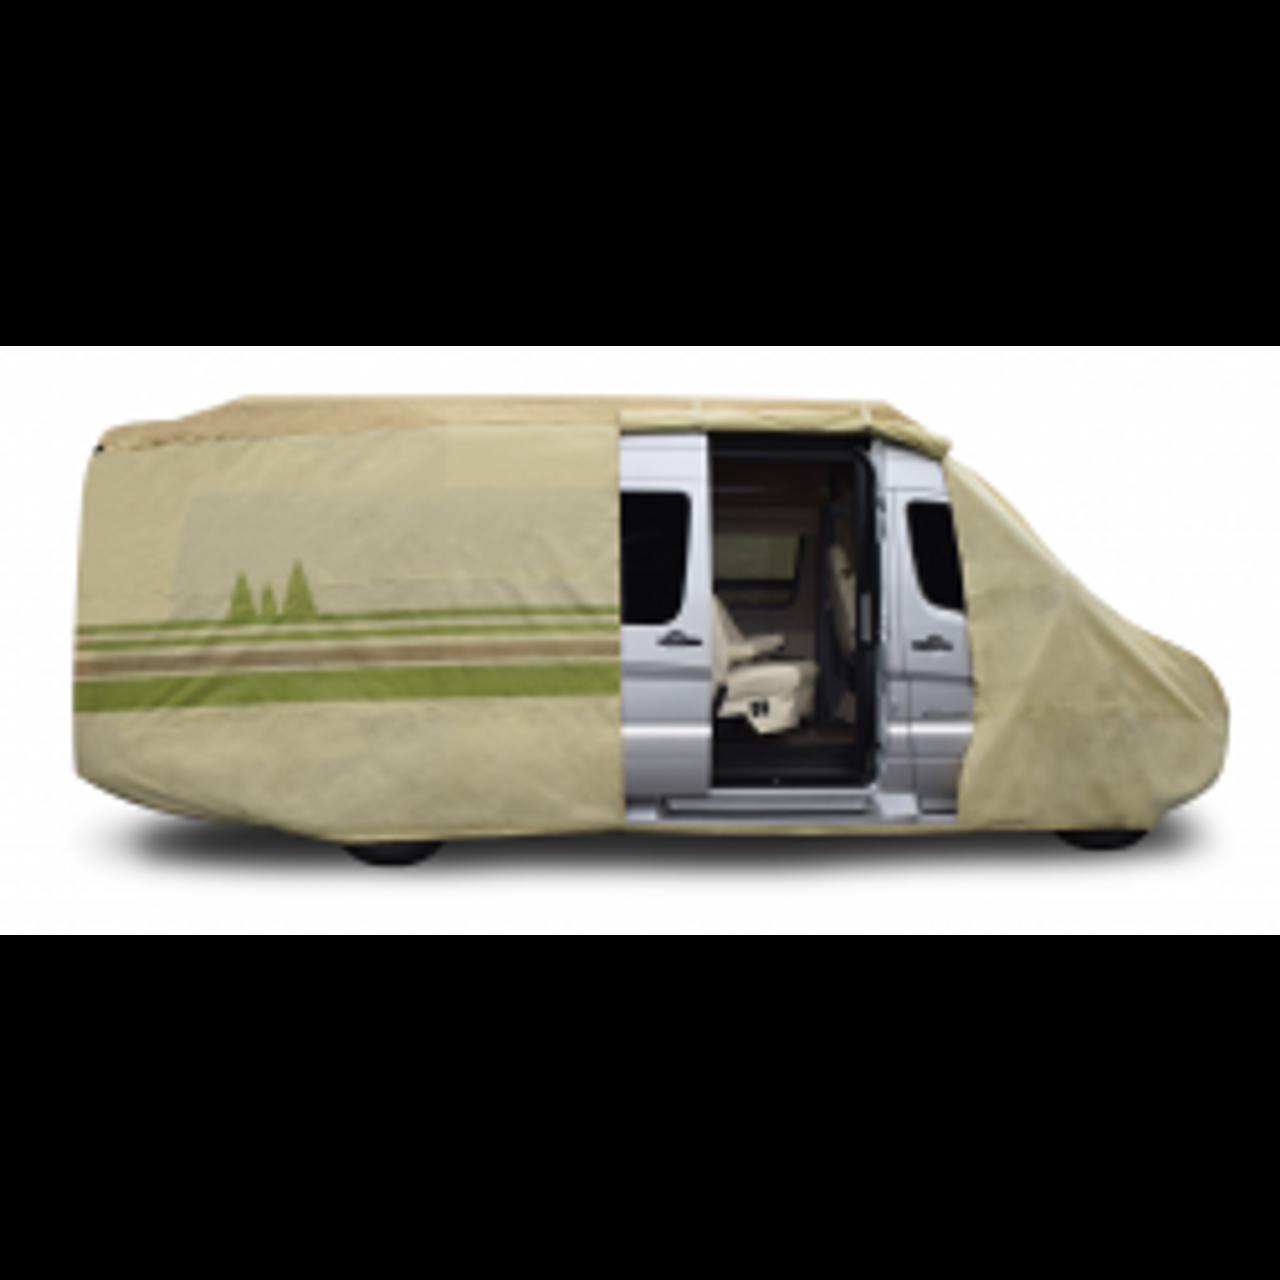 Winnebago Contour-fit RV Covers for Class C